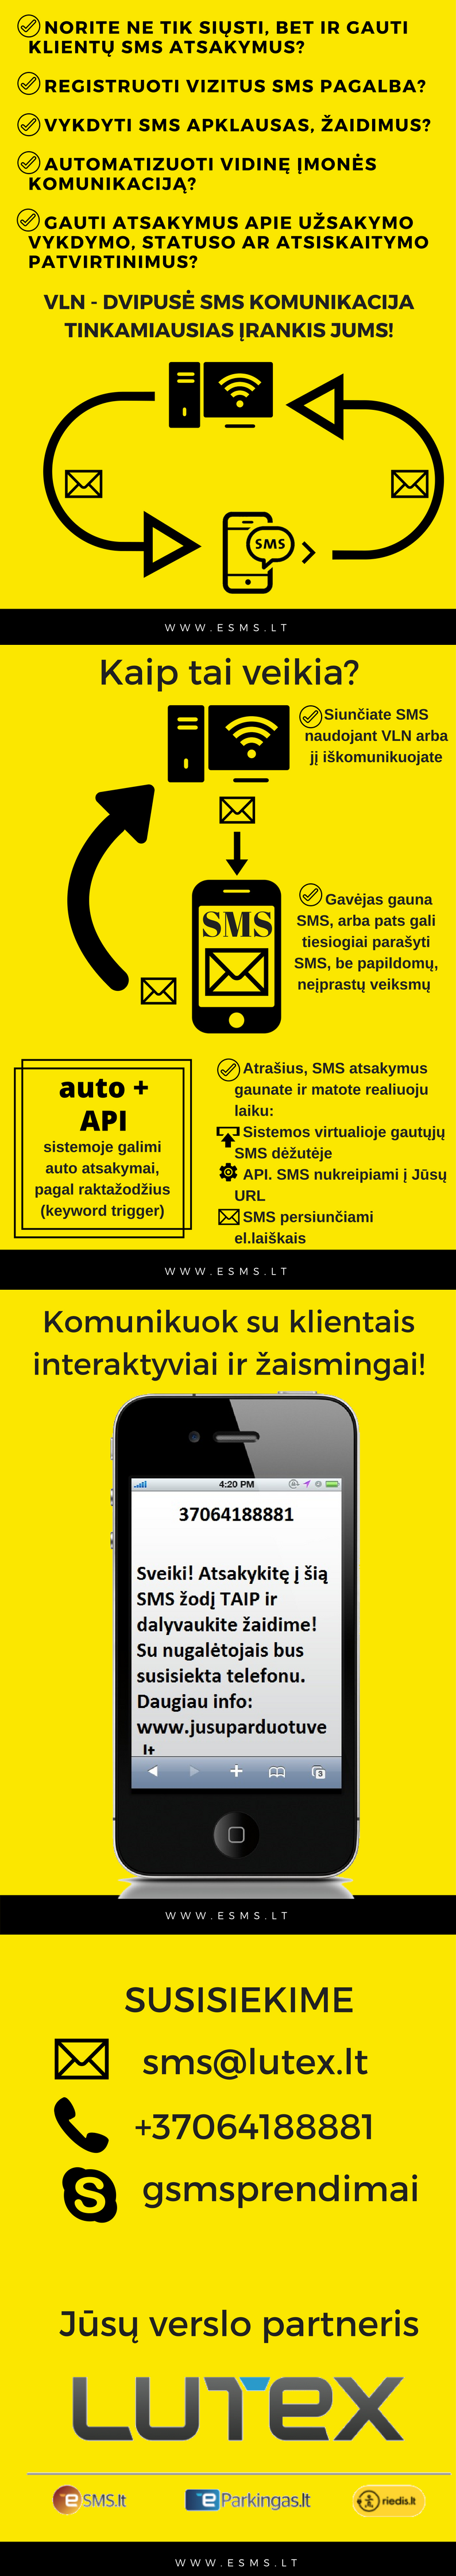 vln_dvipuses_2way_SMS.png